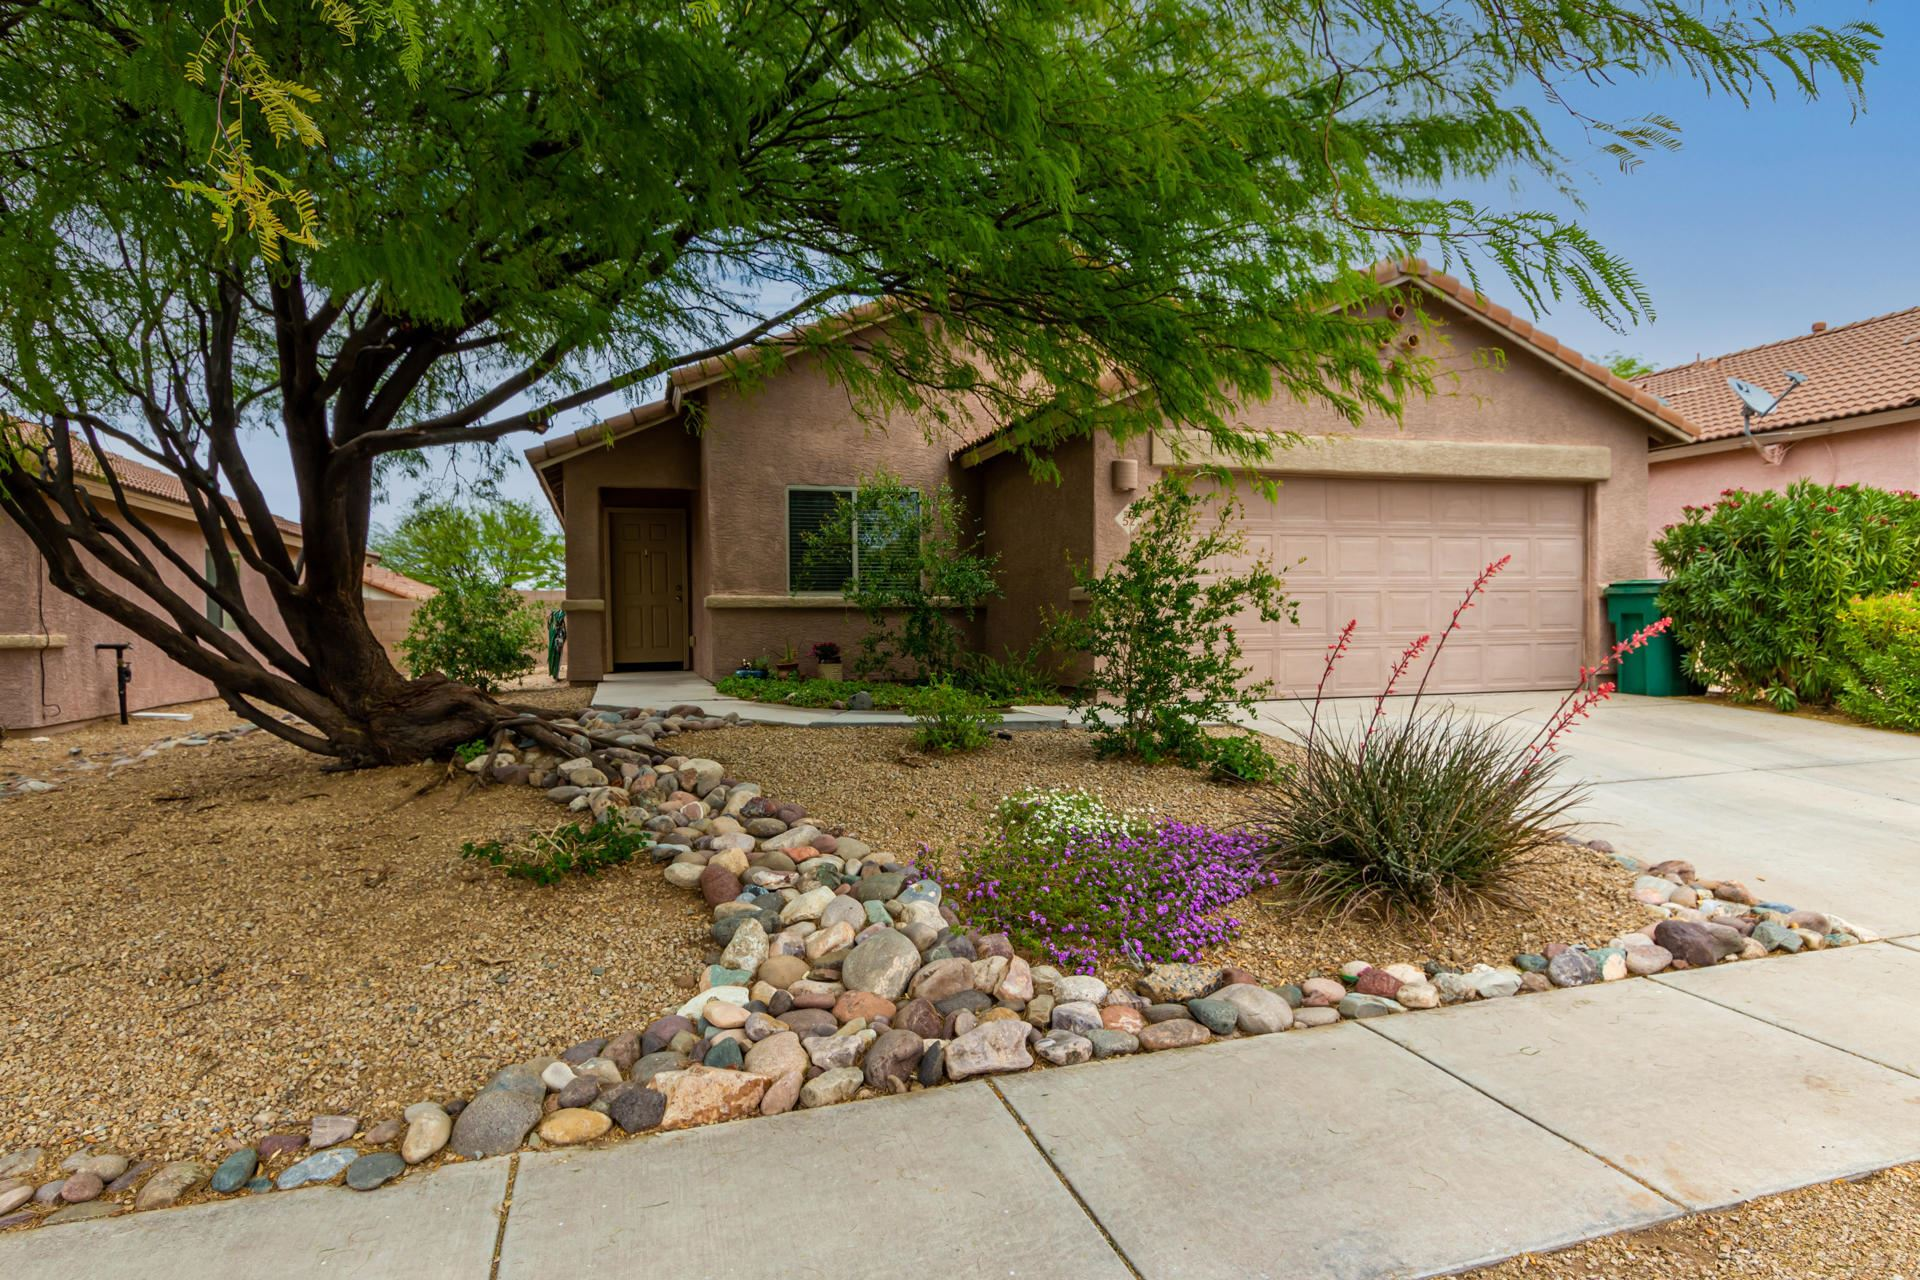 52 W Eric Dorman Street, Vail, AZ 85641 - MLS#: 22109954